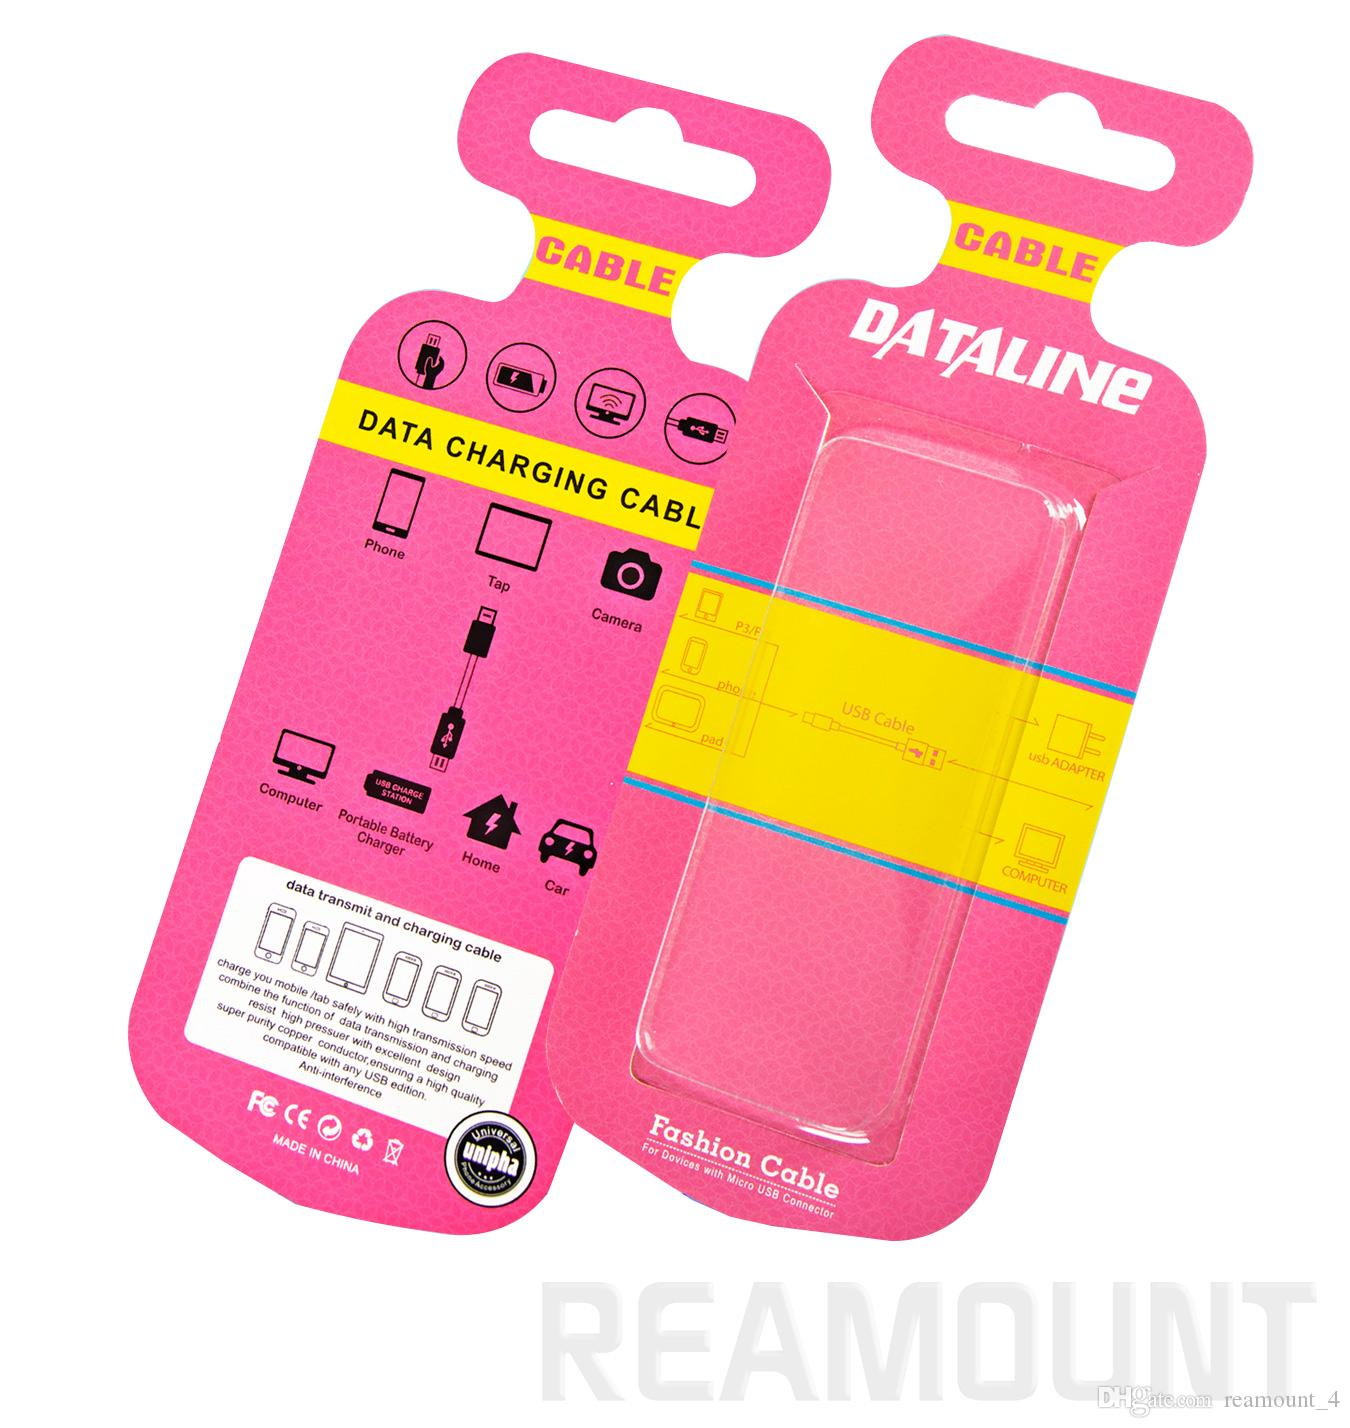 Atacado de papel colorido e caixa de embalagem de plástico PVC para iPhone Samsung Cabo USB de embalagem de varejo caixa para linha de carregador